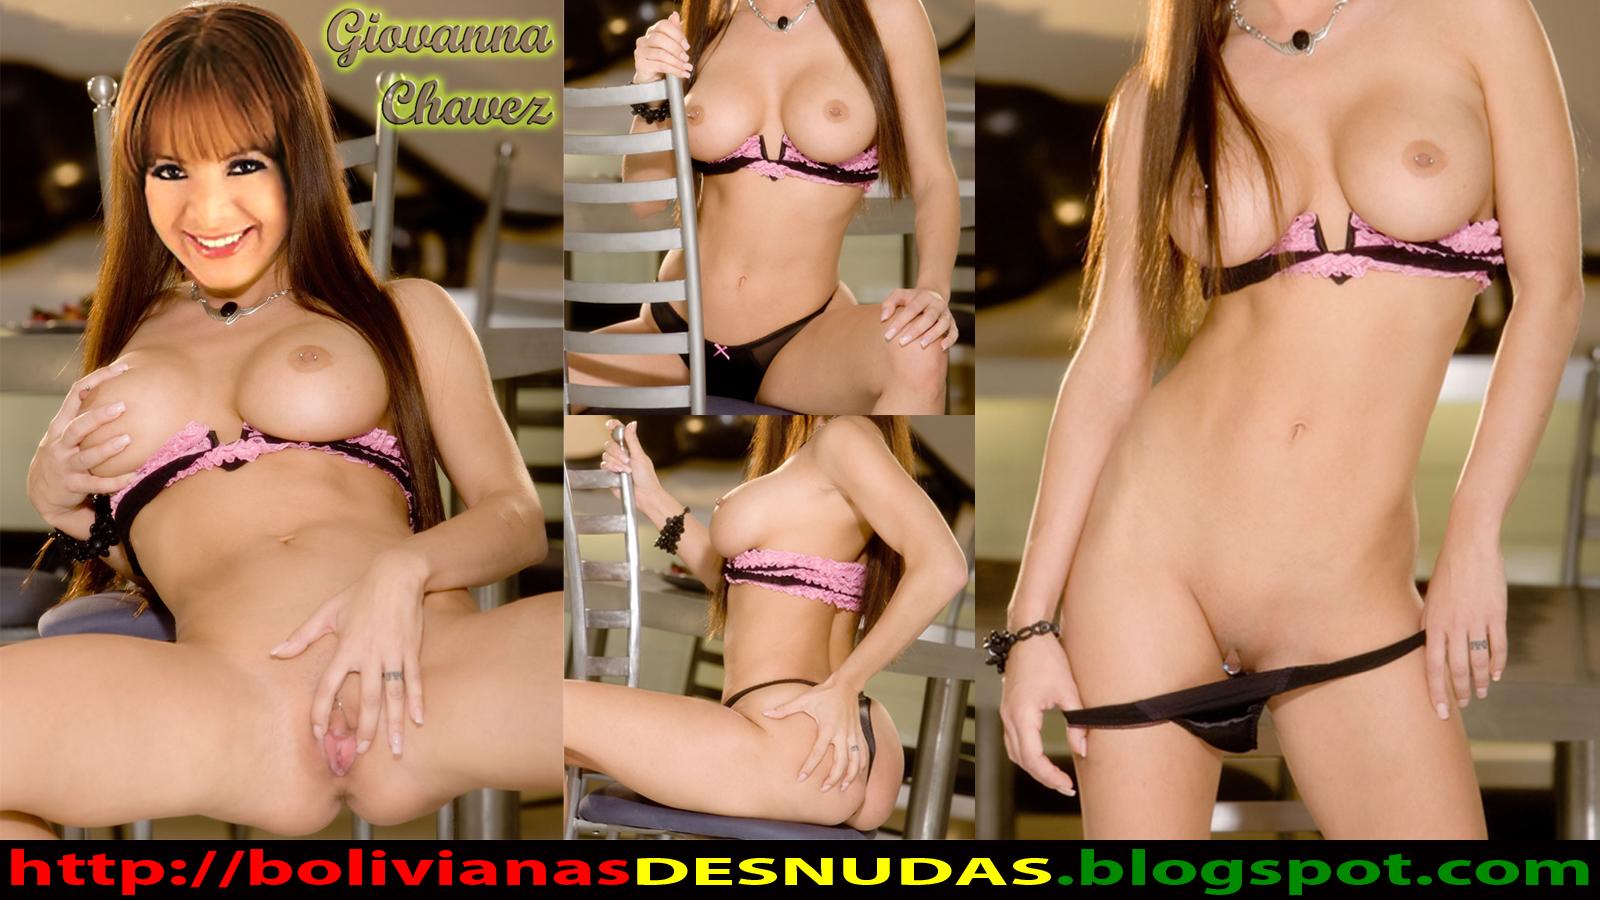 Bolivianas Famosas Desnudas Giovanna Chavez Cuerazo